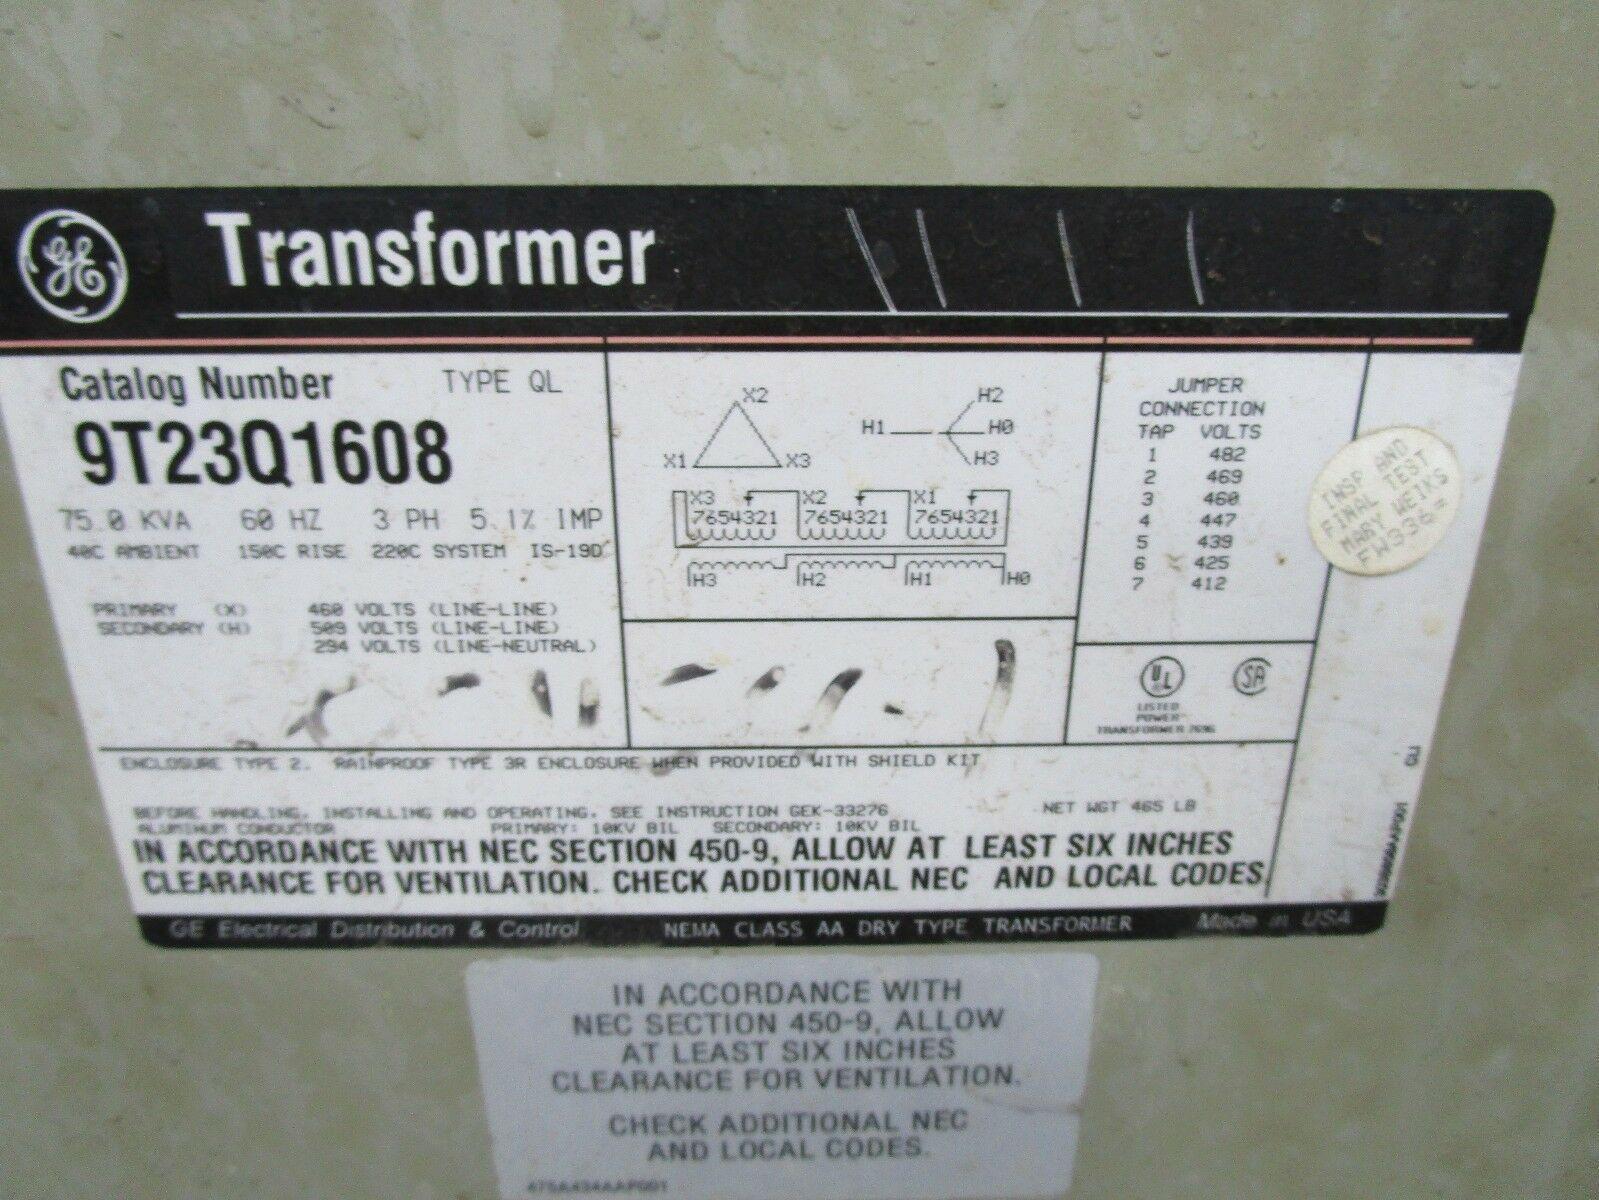 75 KVA GENERAL ELECTRIC TRANSFORMER, Model 9T23Q1608, 3-Phase, 460 Volt Input Delta, 509 Volt Output Line to Line Y, 294 Volt Line to Ground, 60 Hz, Multi Tap, Dry Type.